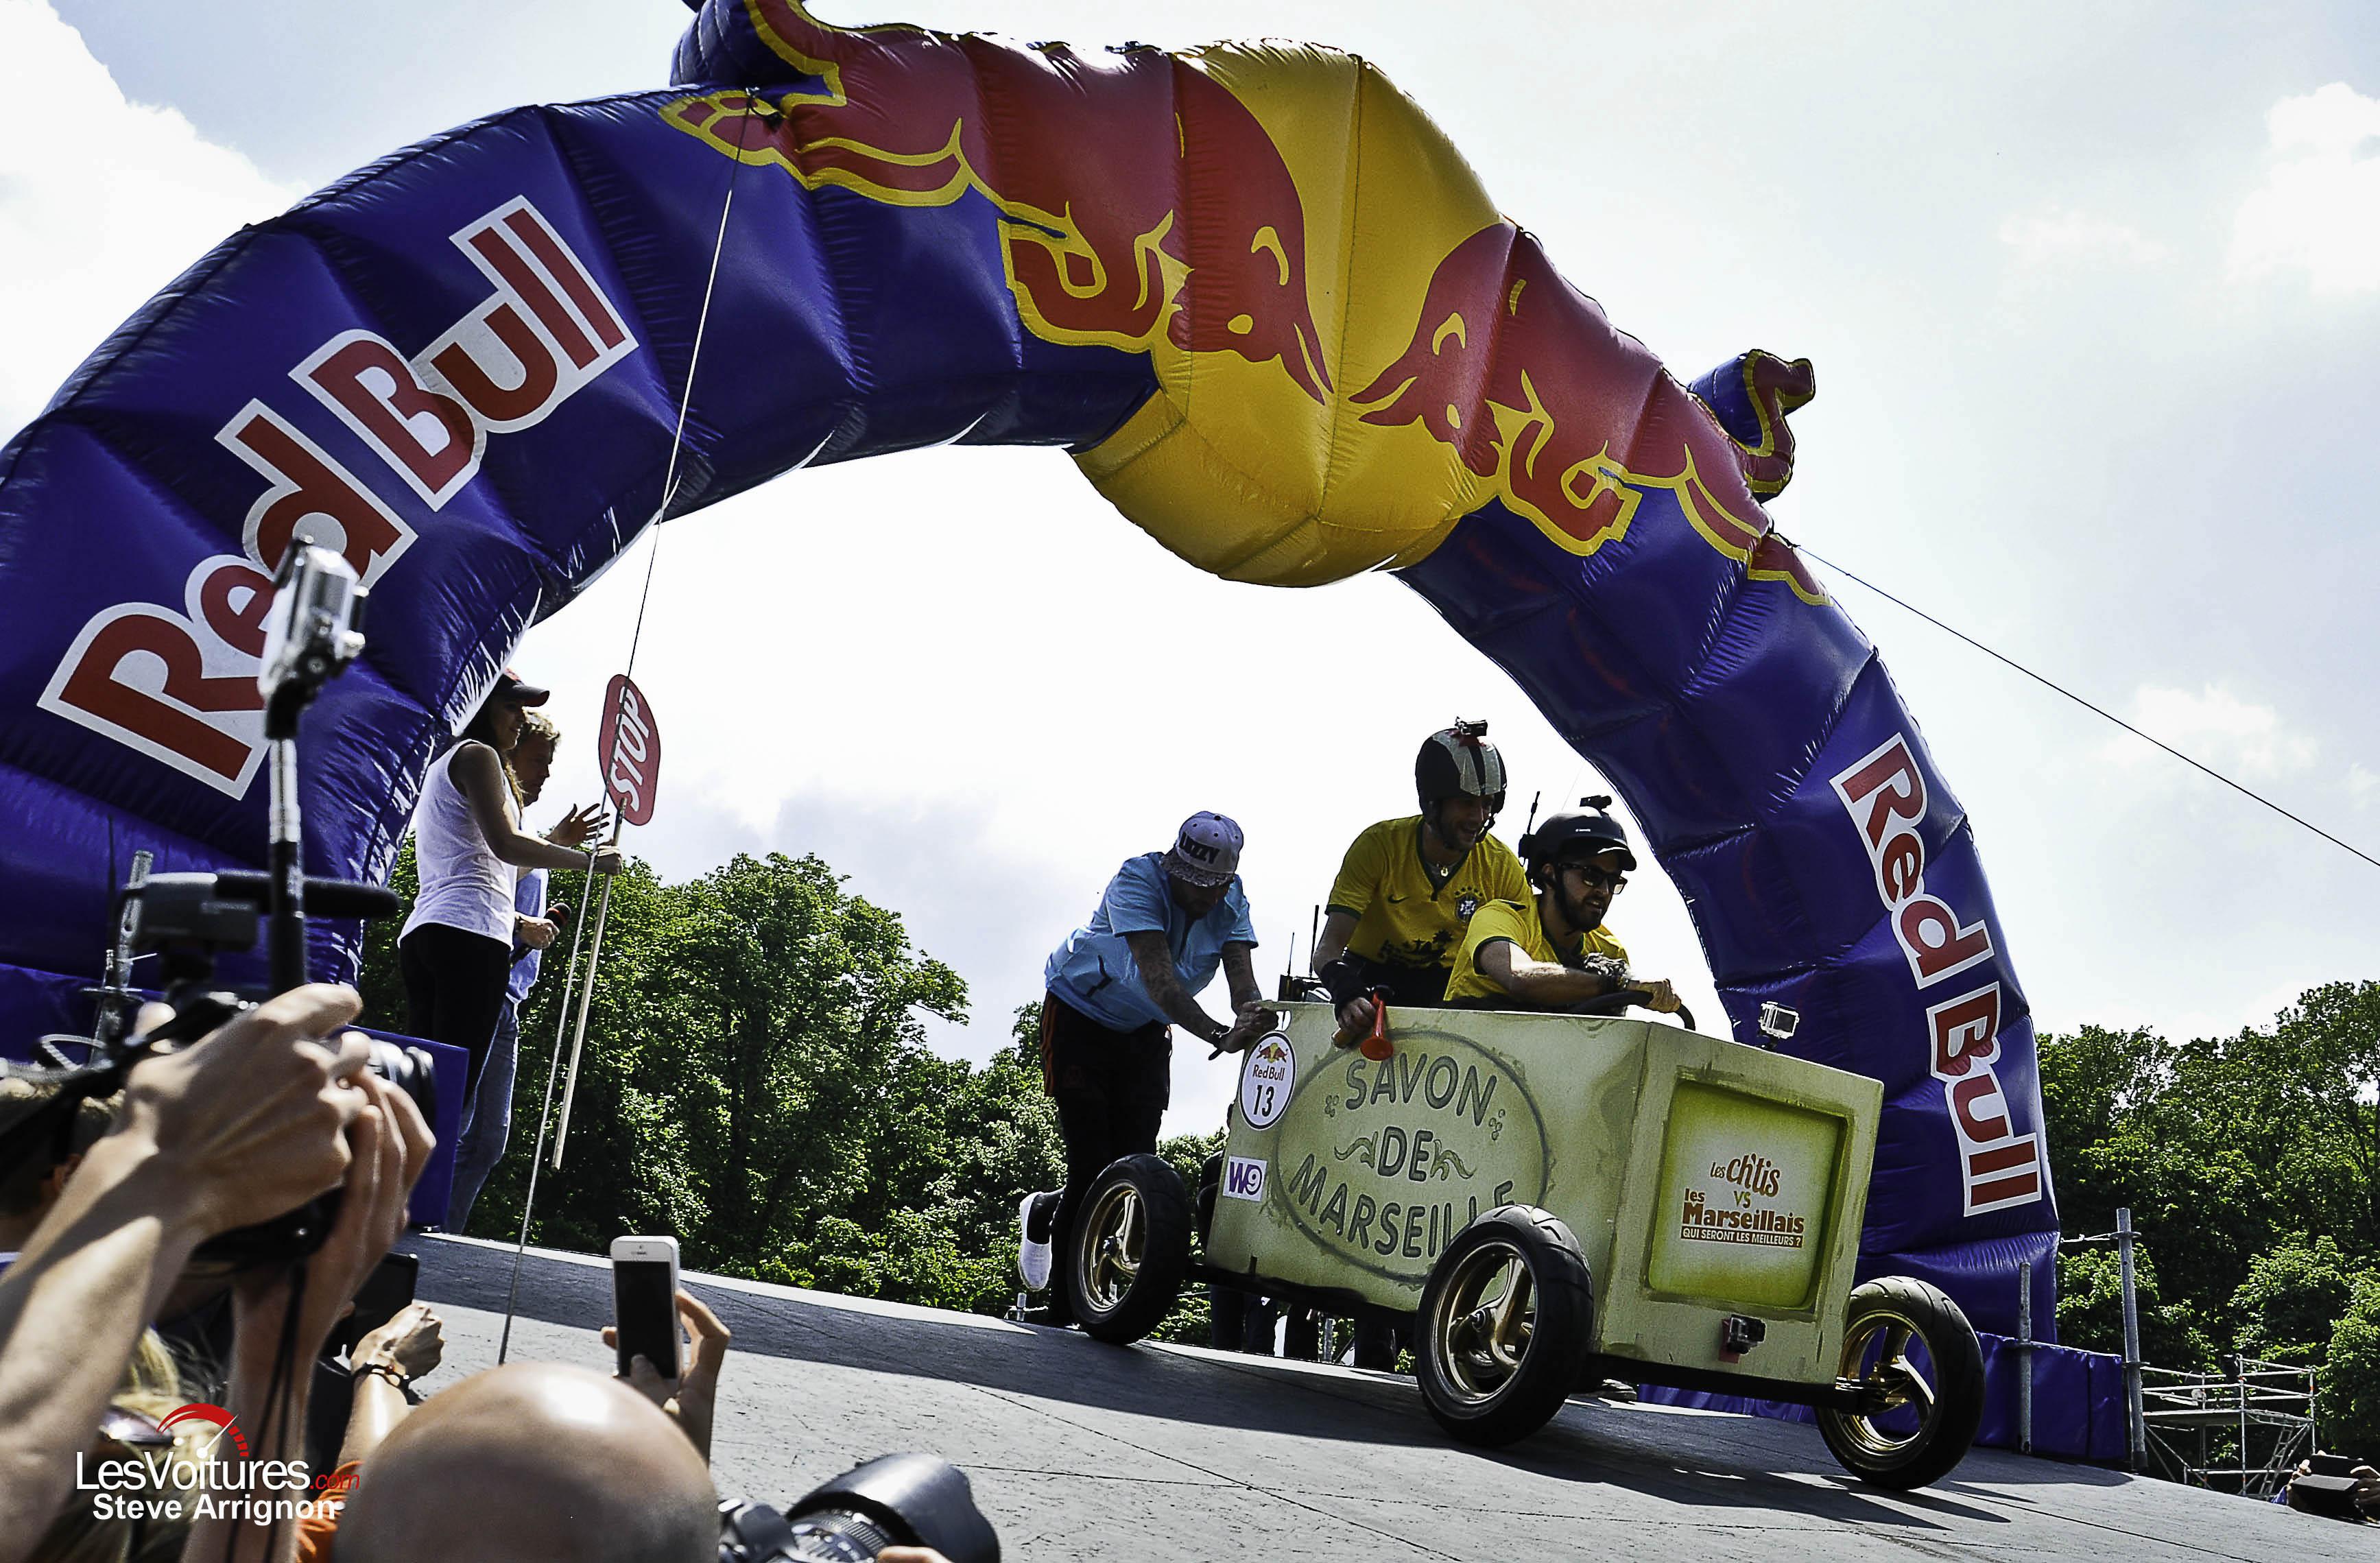 Red-Bull-Caisses-a-savon-2014 (15)